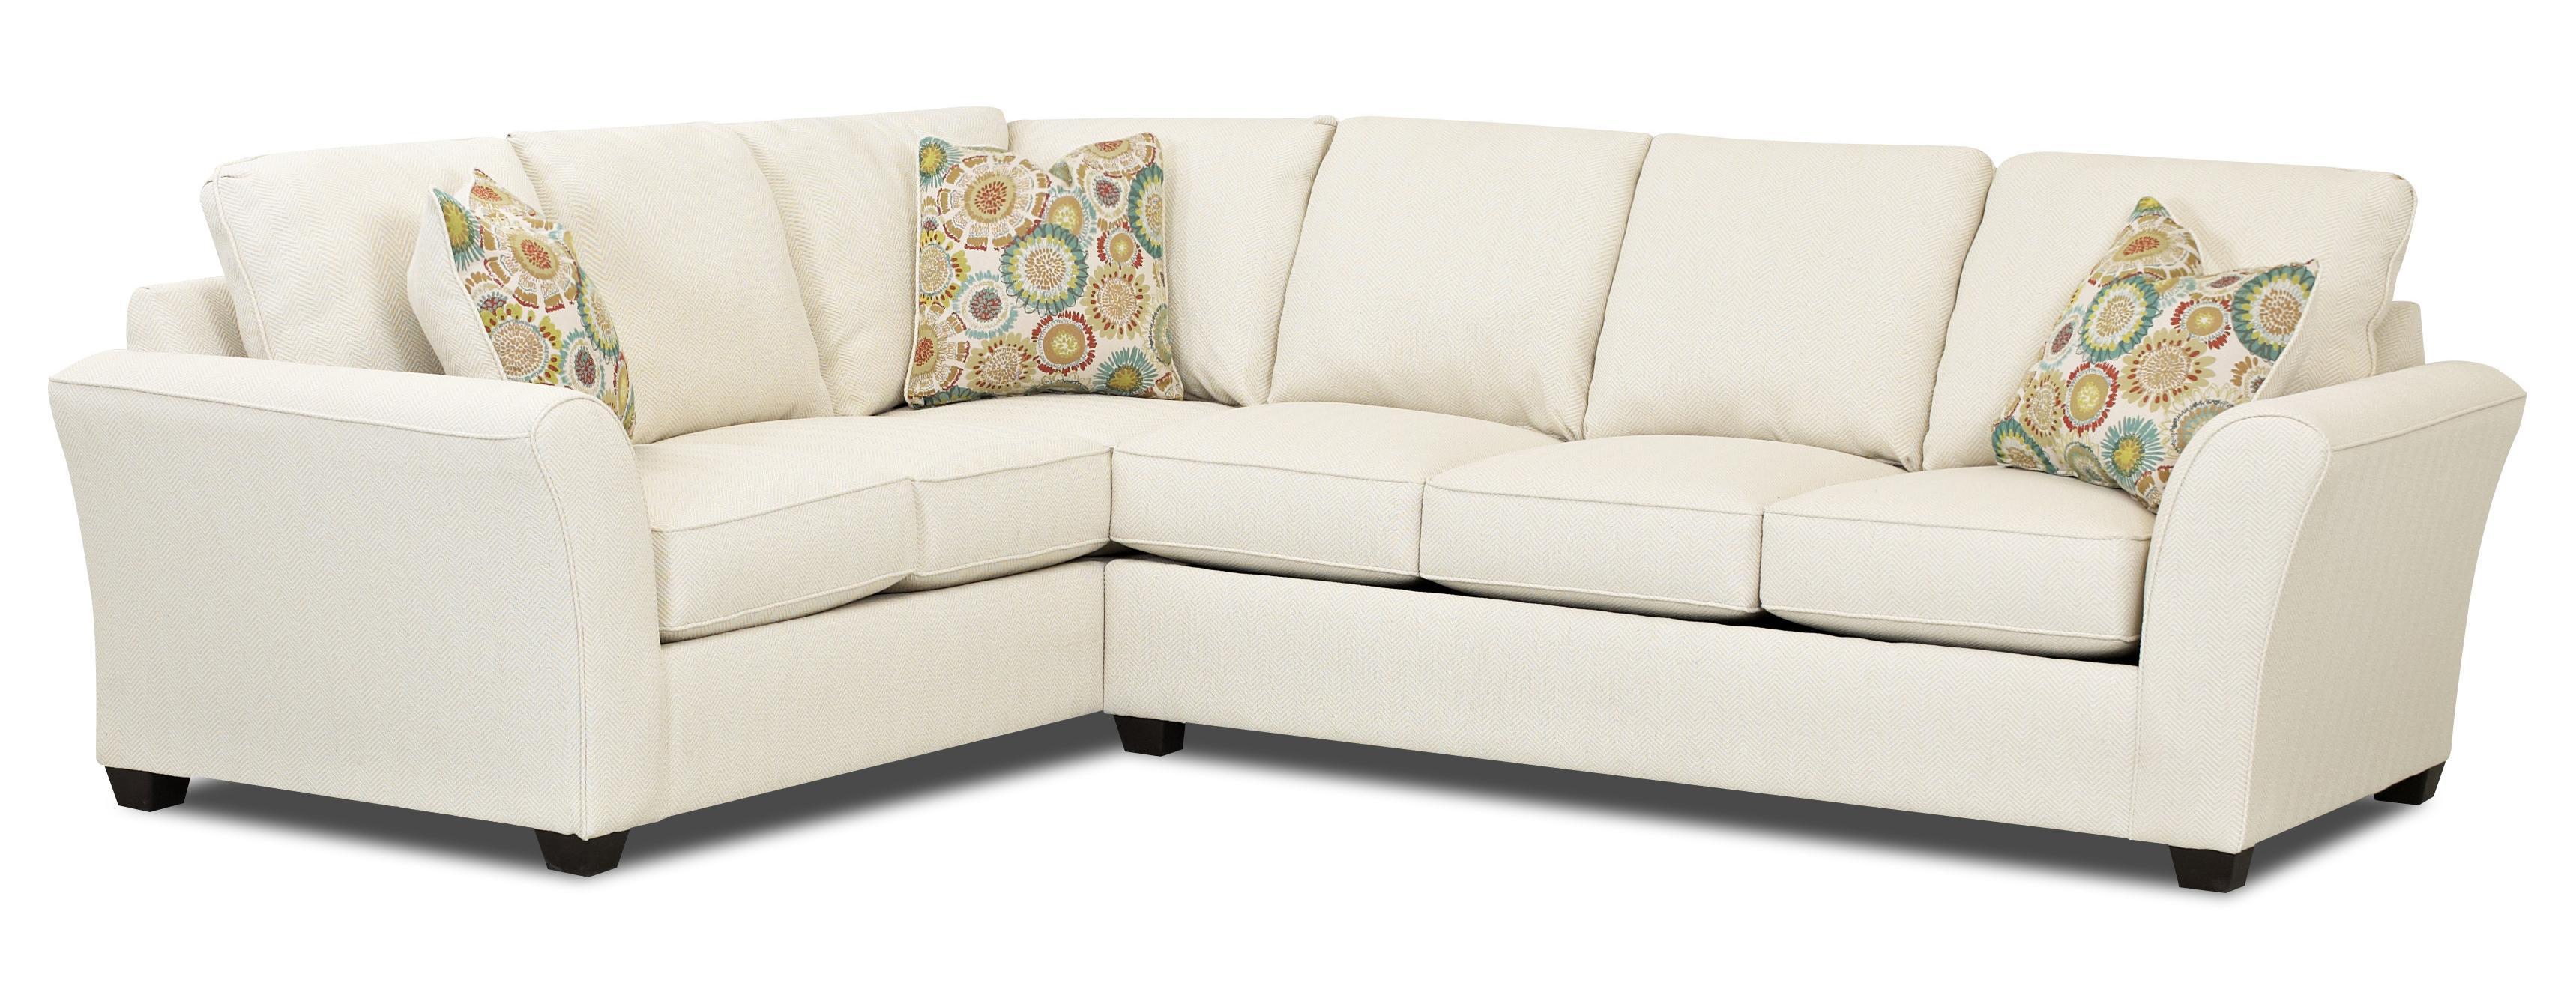 Klaussner Sedgewick Transitional Sectional Sleeper Sofa With Dreamquest Mattress Ahfa Dealer Locator